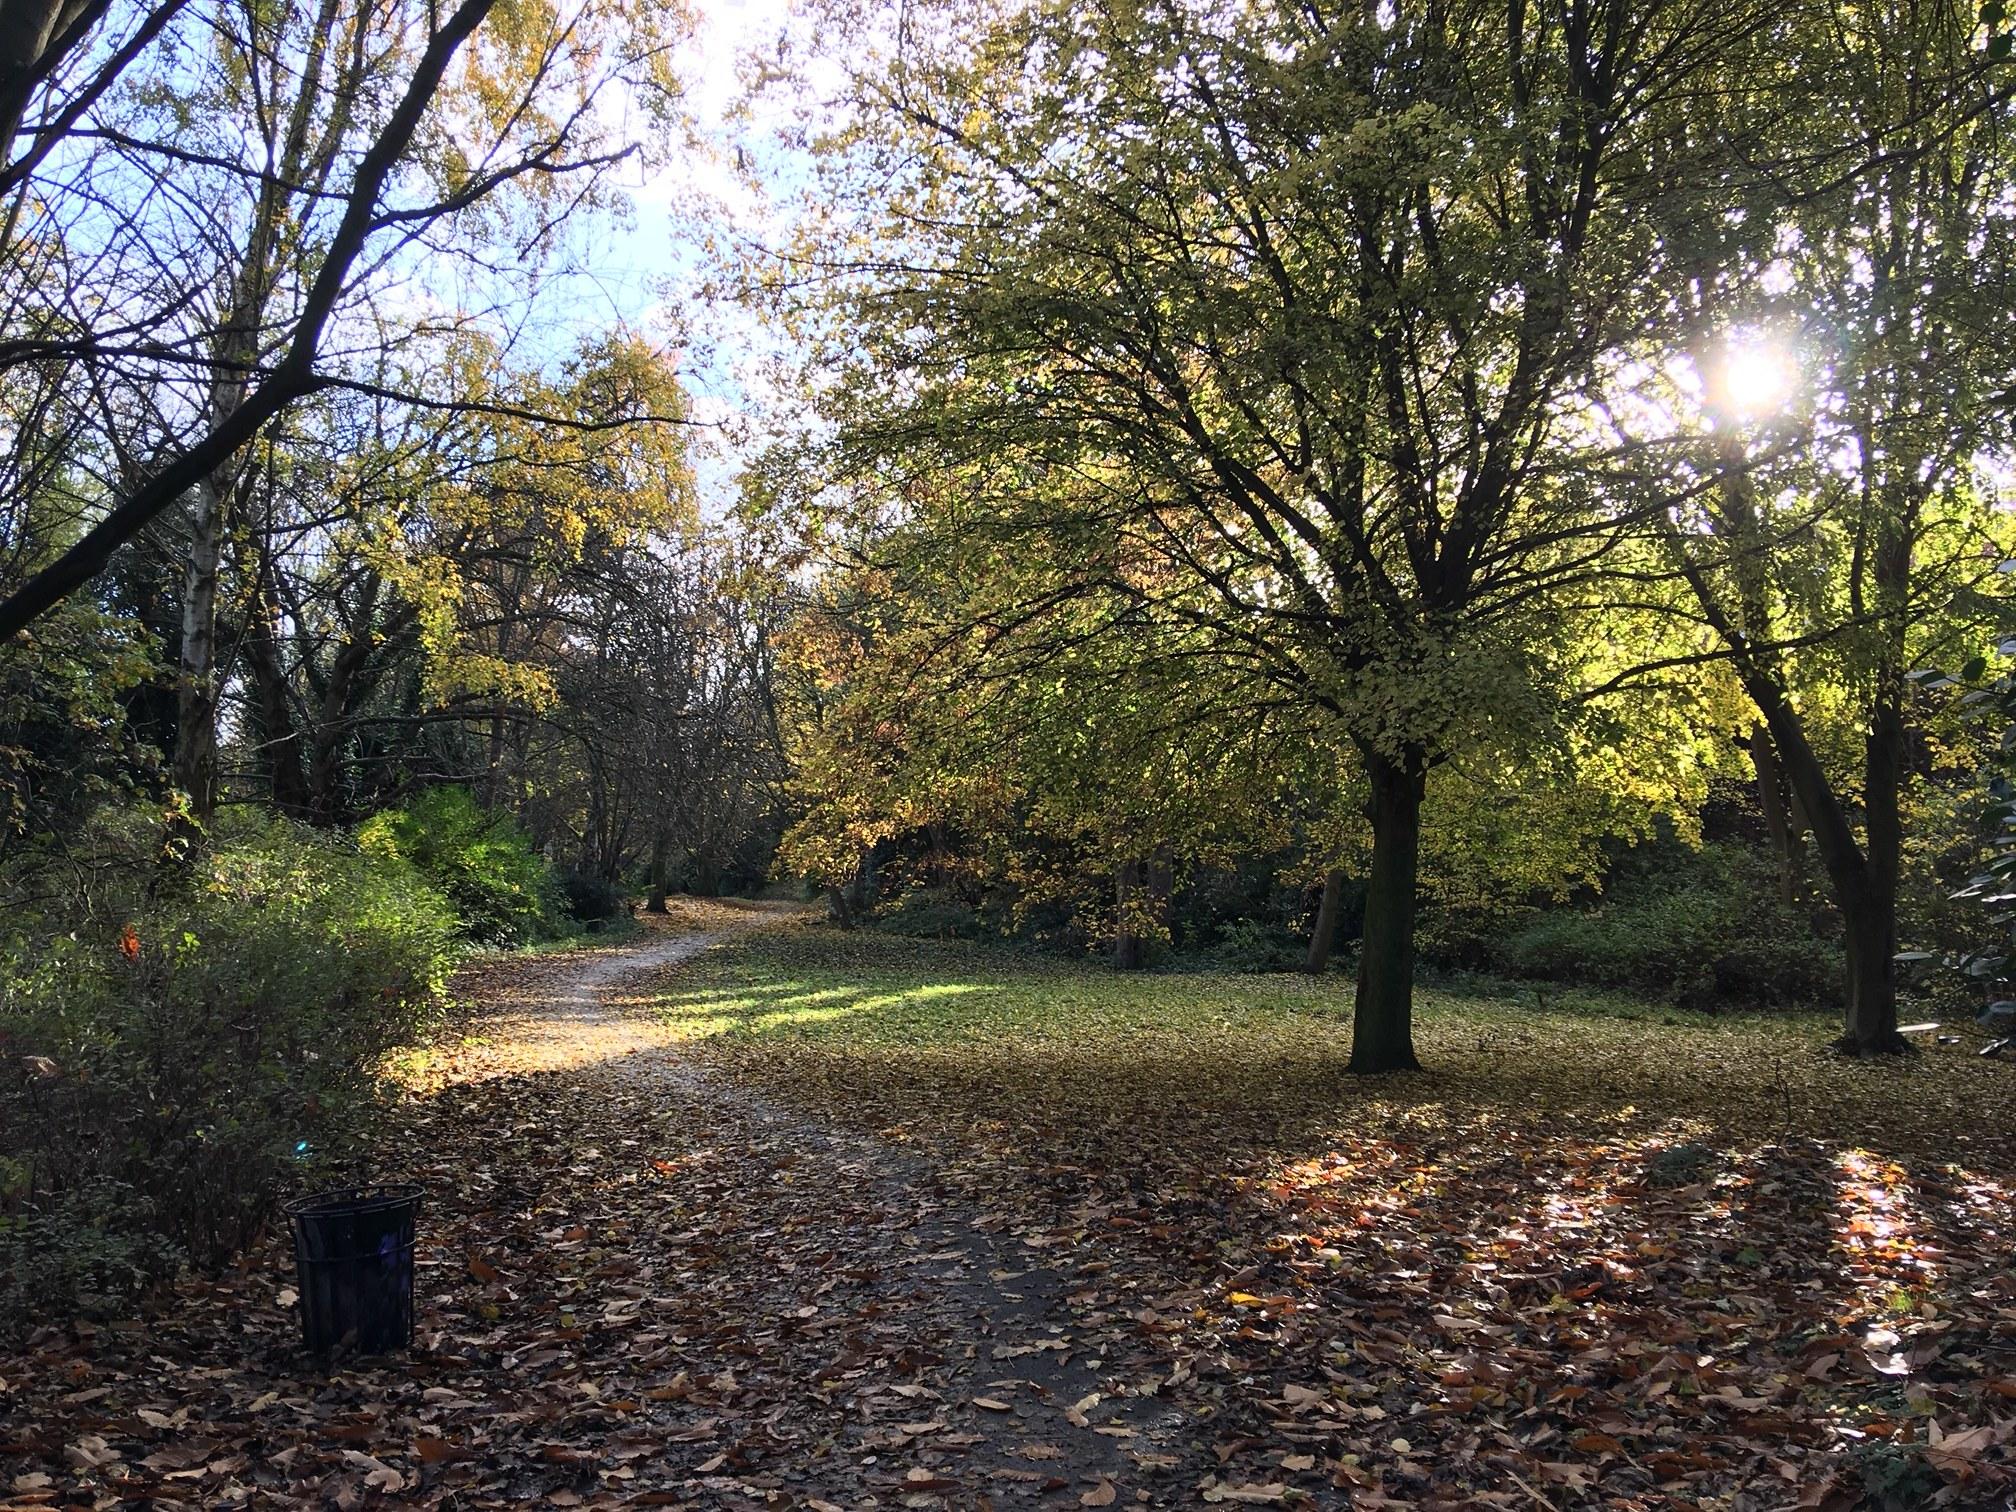 Dingley Dell (former Rock Garden), Woodhouse Ridge © RT